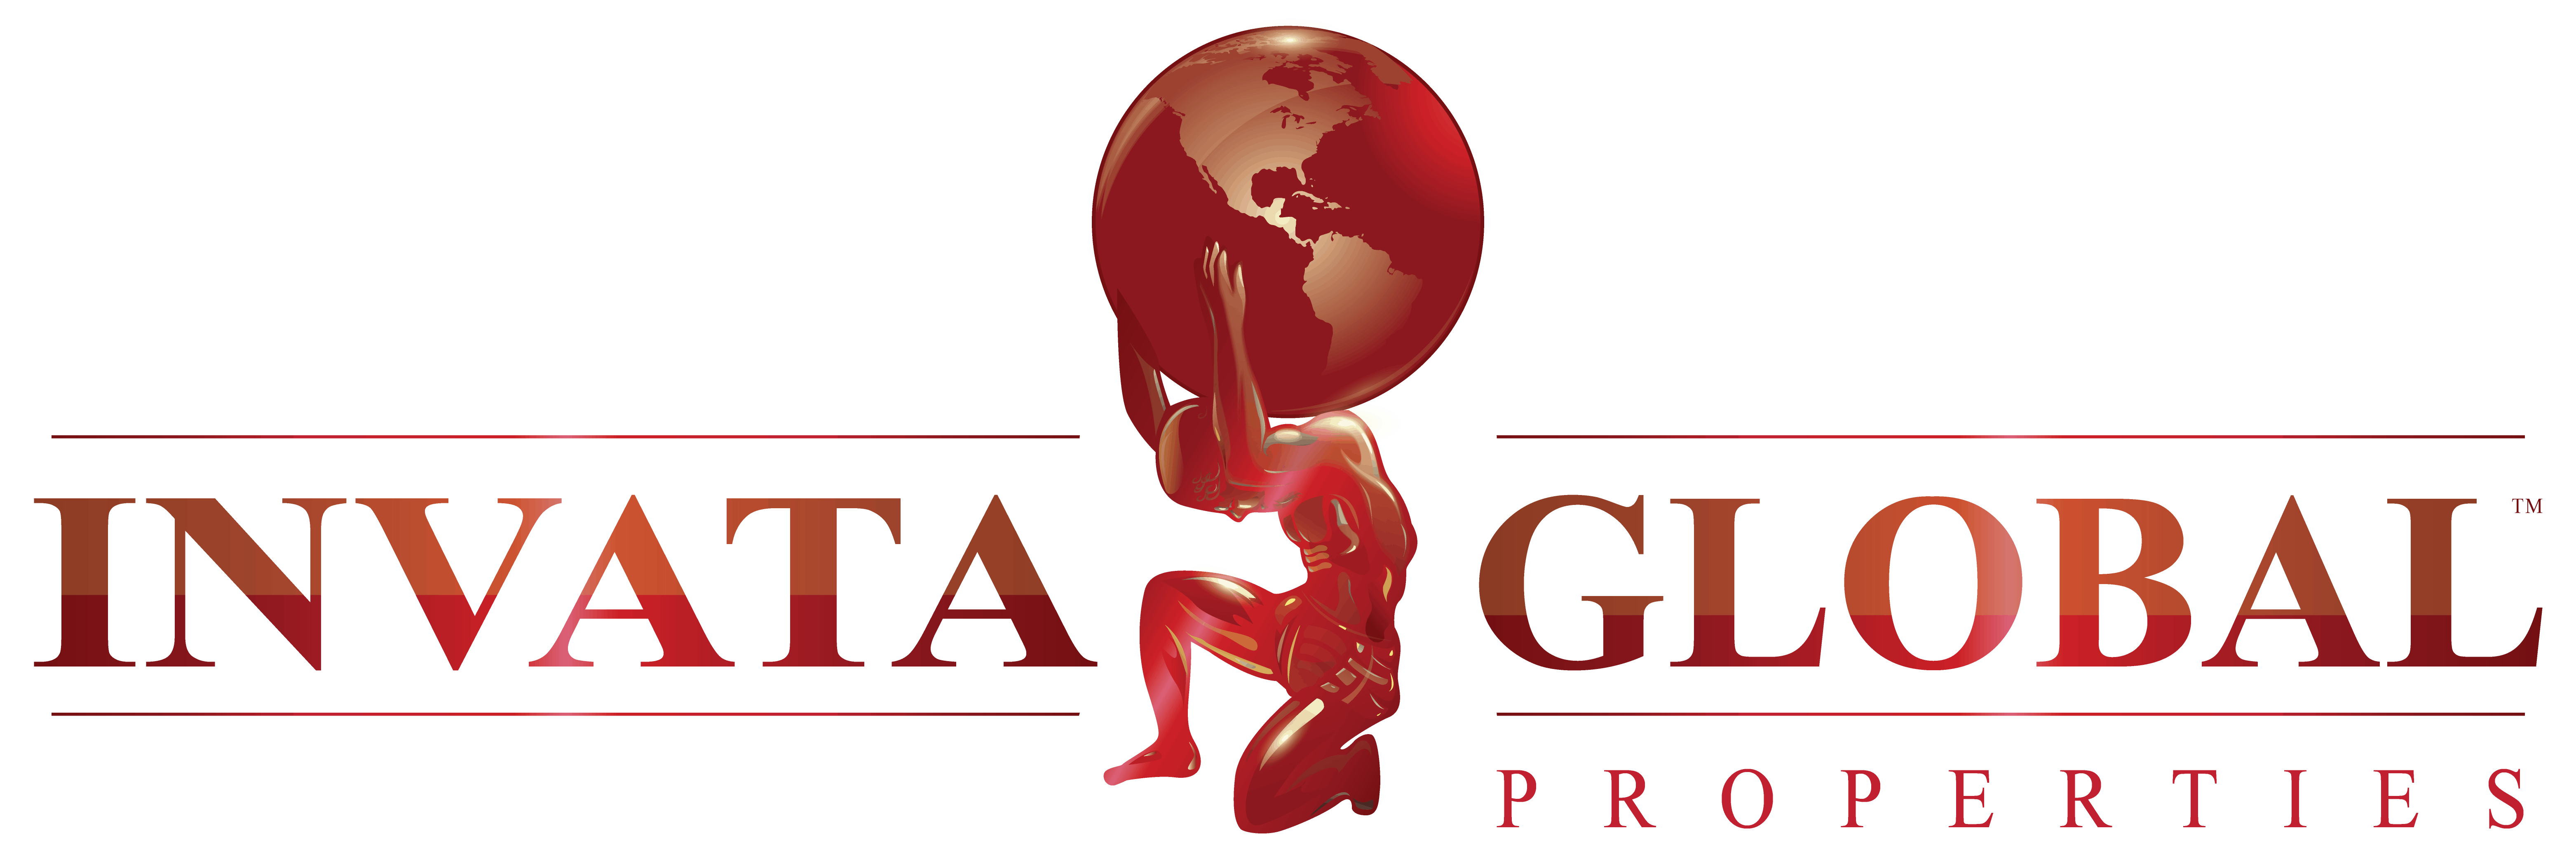 Invata Global Properties logo